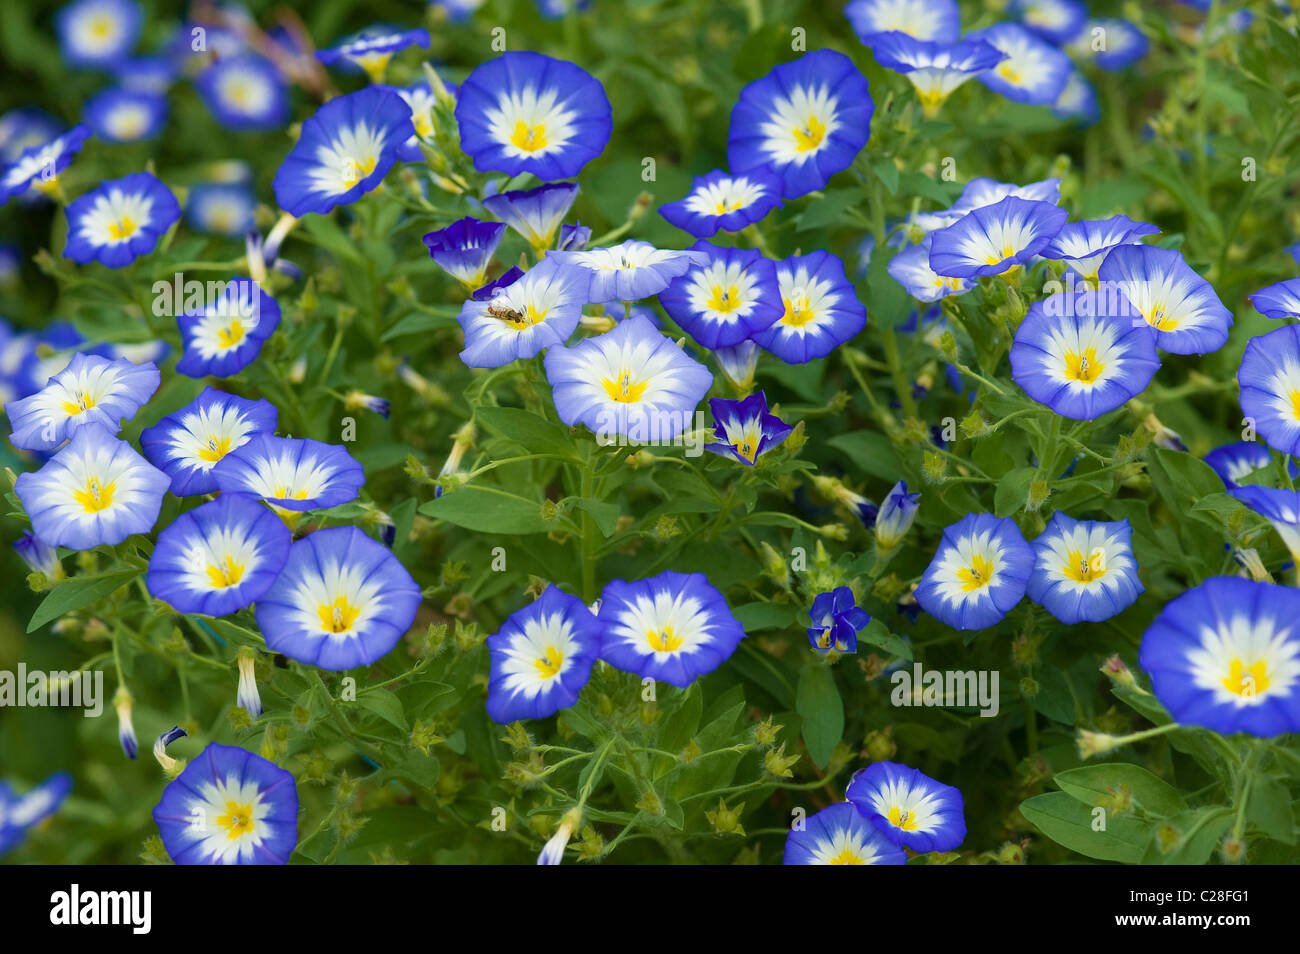 Dwarf Morning Glory (Convolvulus tricolor), flowering. - Stock Image